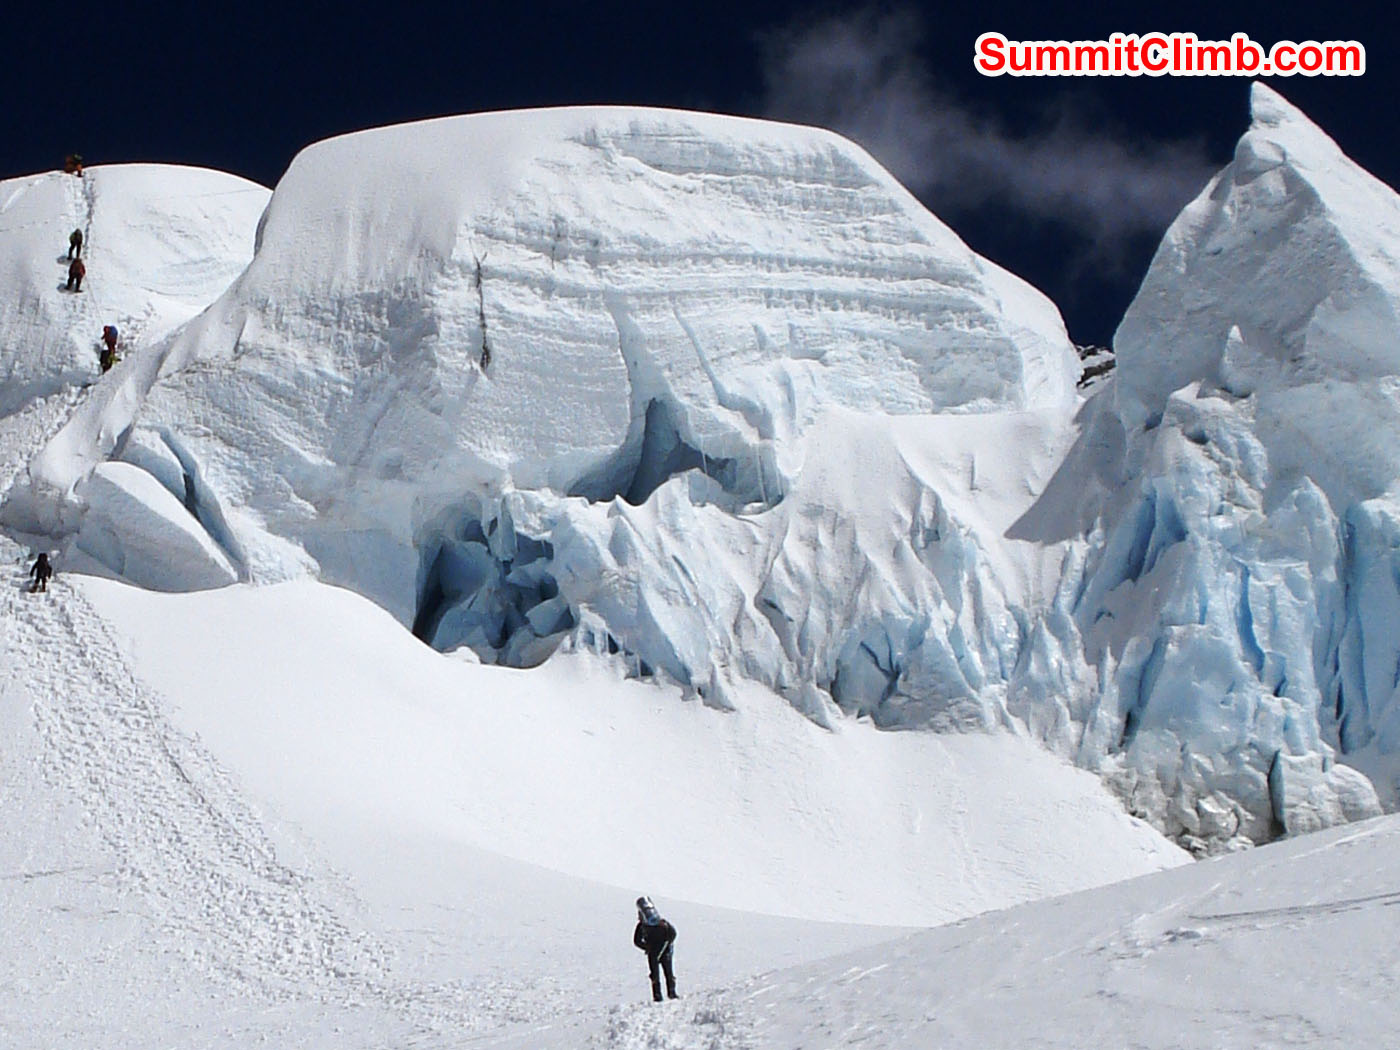 Climbers in the Ice Cliff. Glenn Nyberg Photo